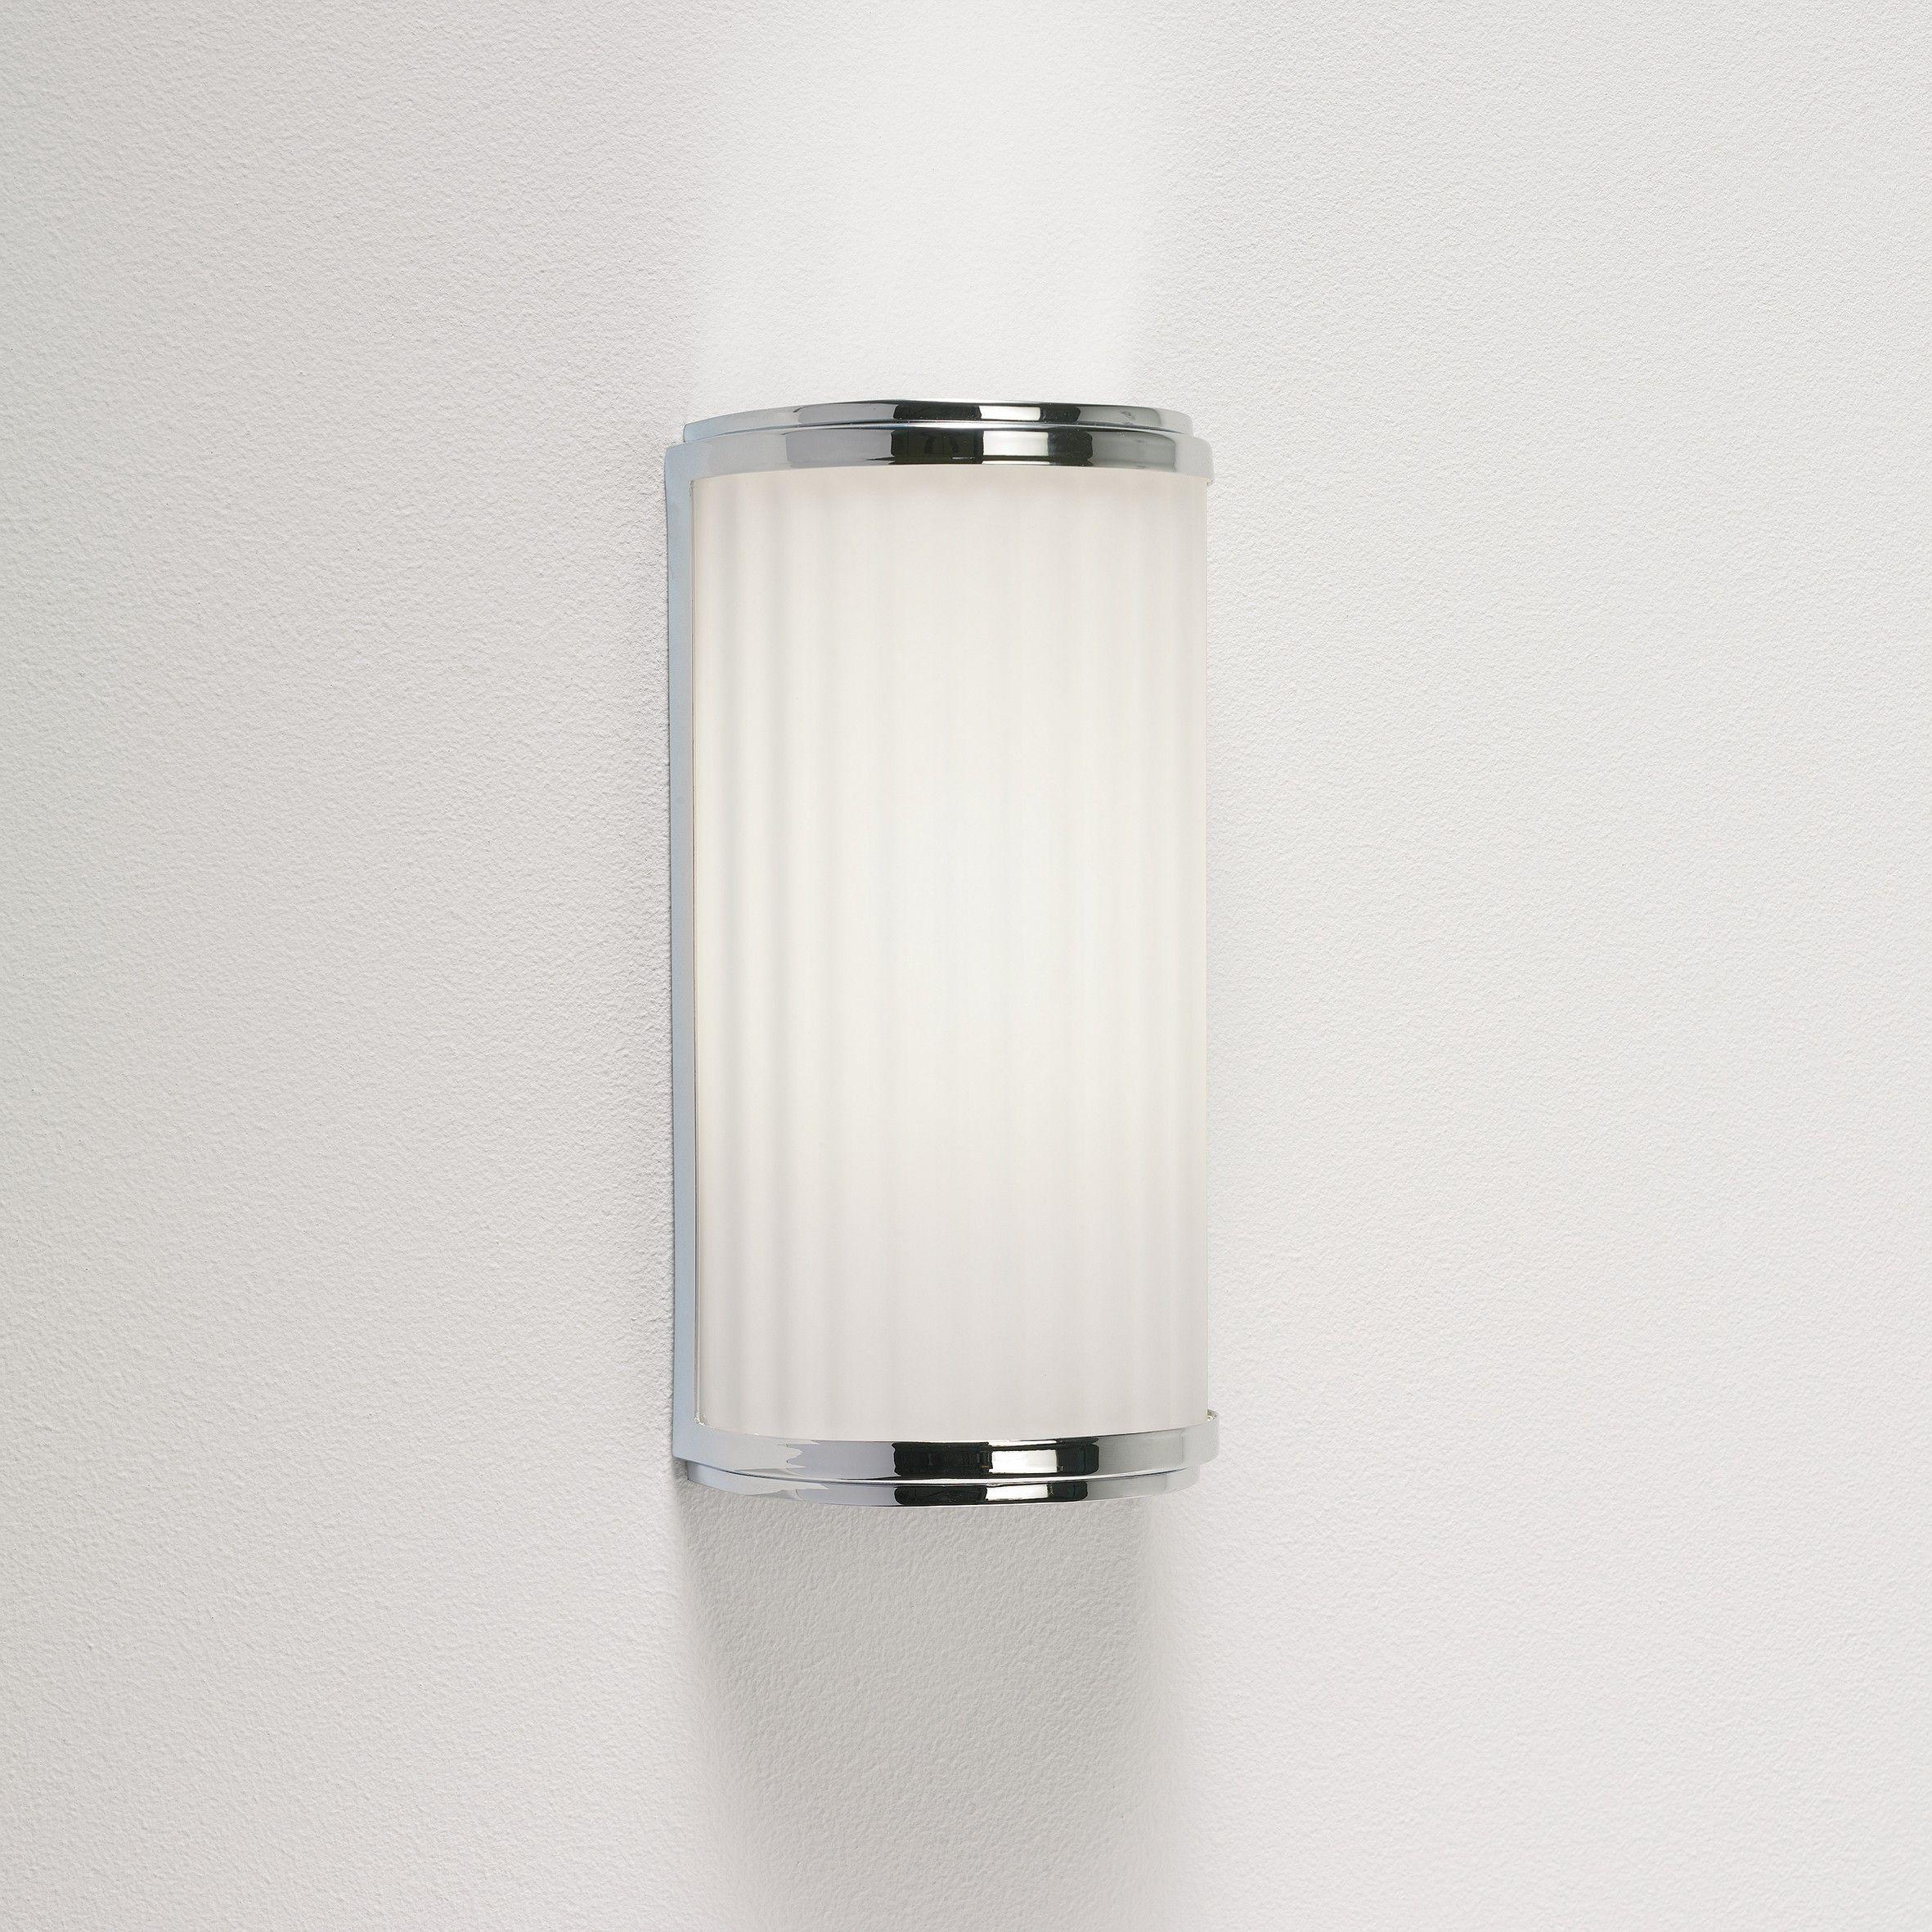 Astro Monza Classic 250 Http Www Leuchte De Astro Monza Classic 250 Wandleuchte Badezimmerspiegel Beleuchtung Beleuchteter Spiegel